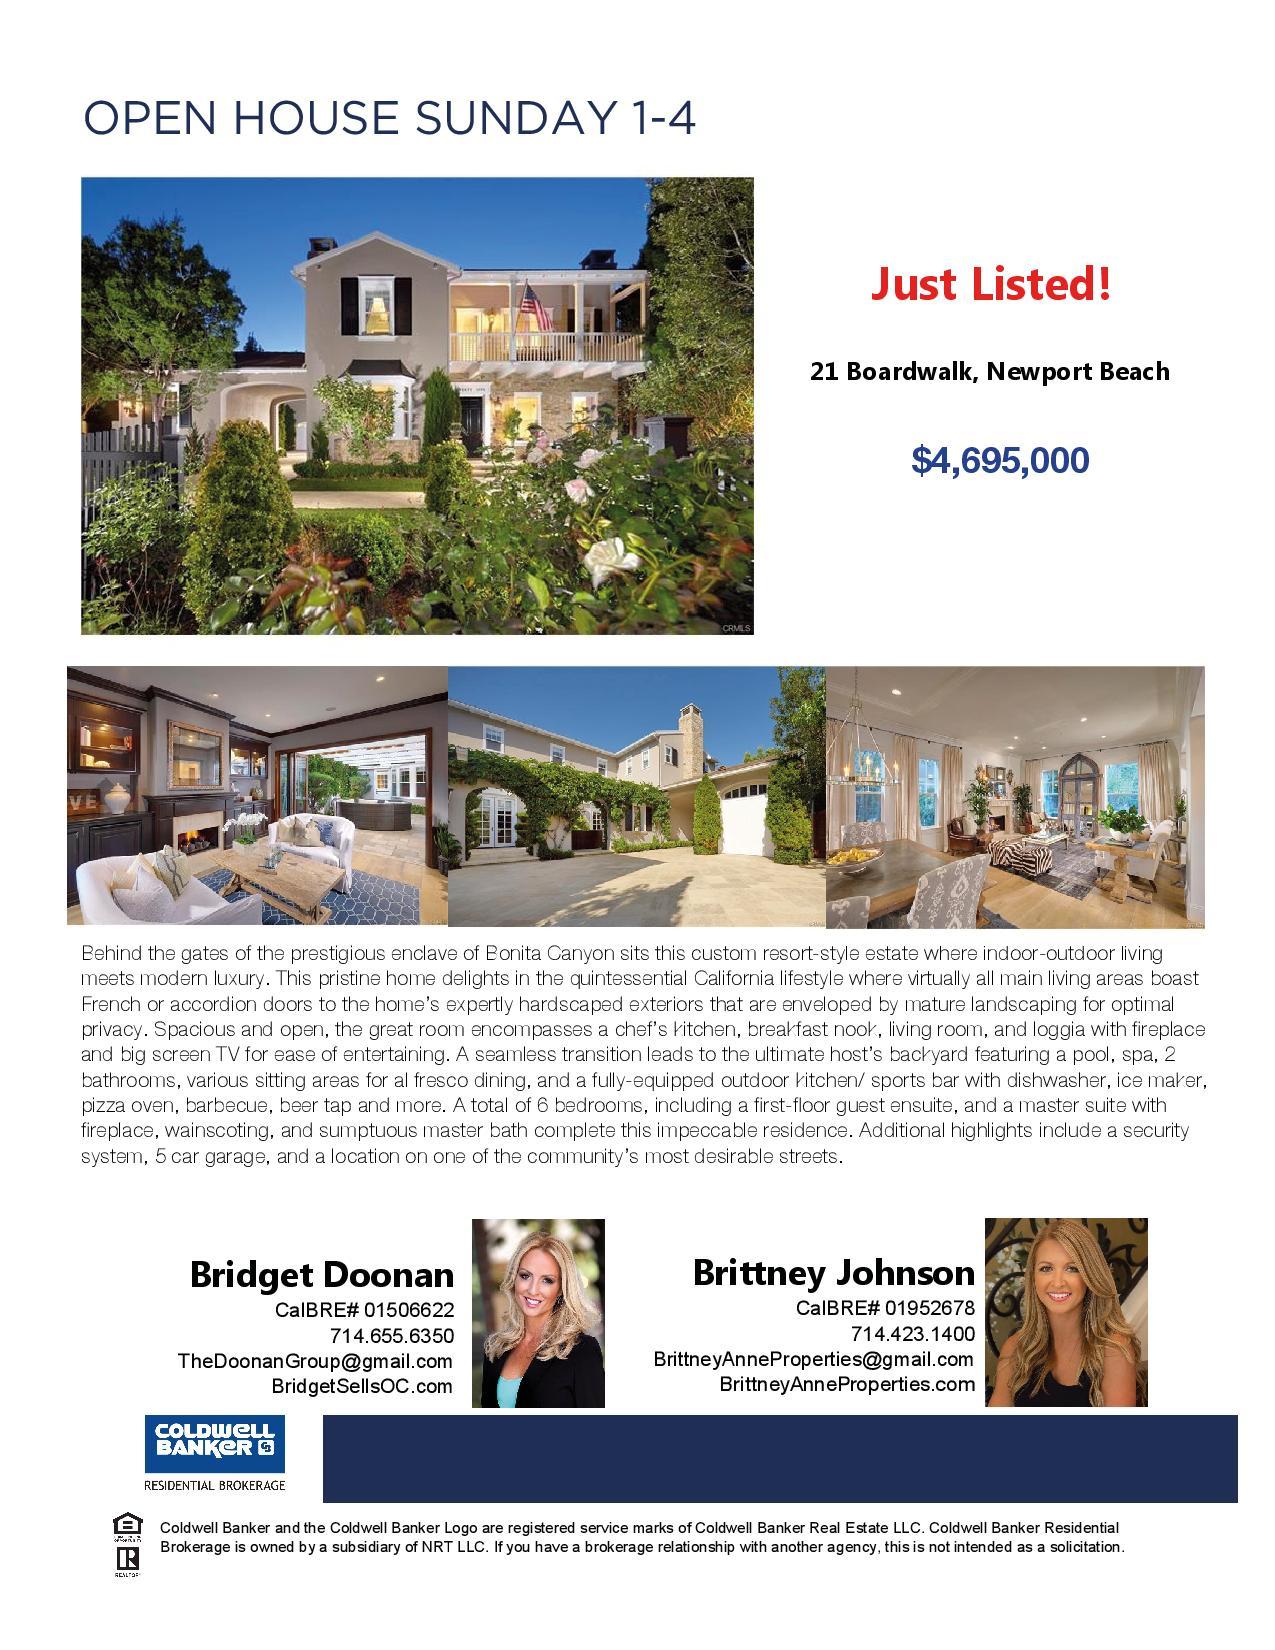 Open House - Newport Beach | Home | Brittney Anne Properties, Realtor